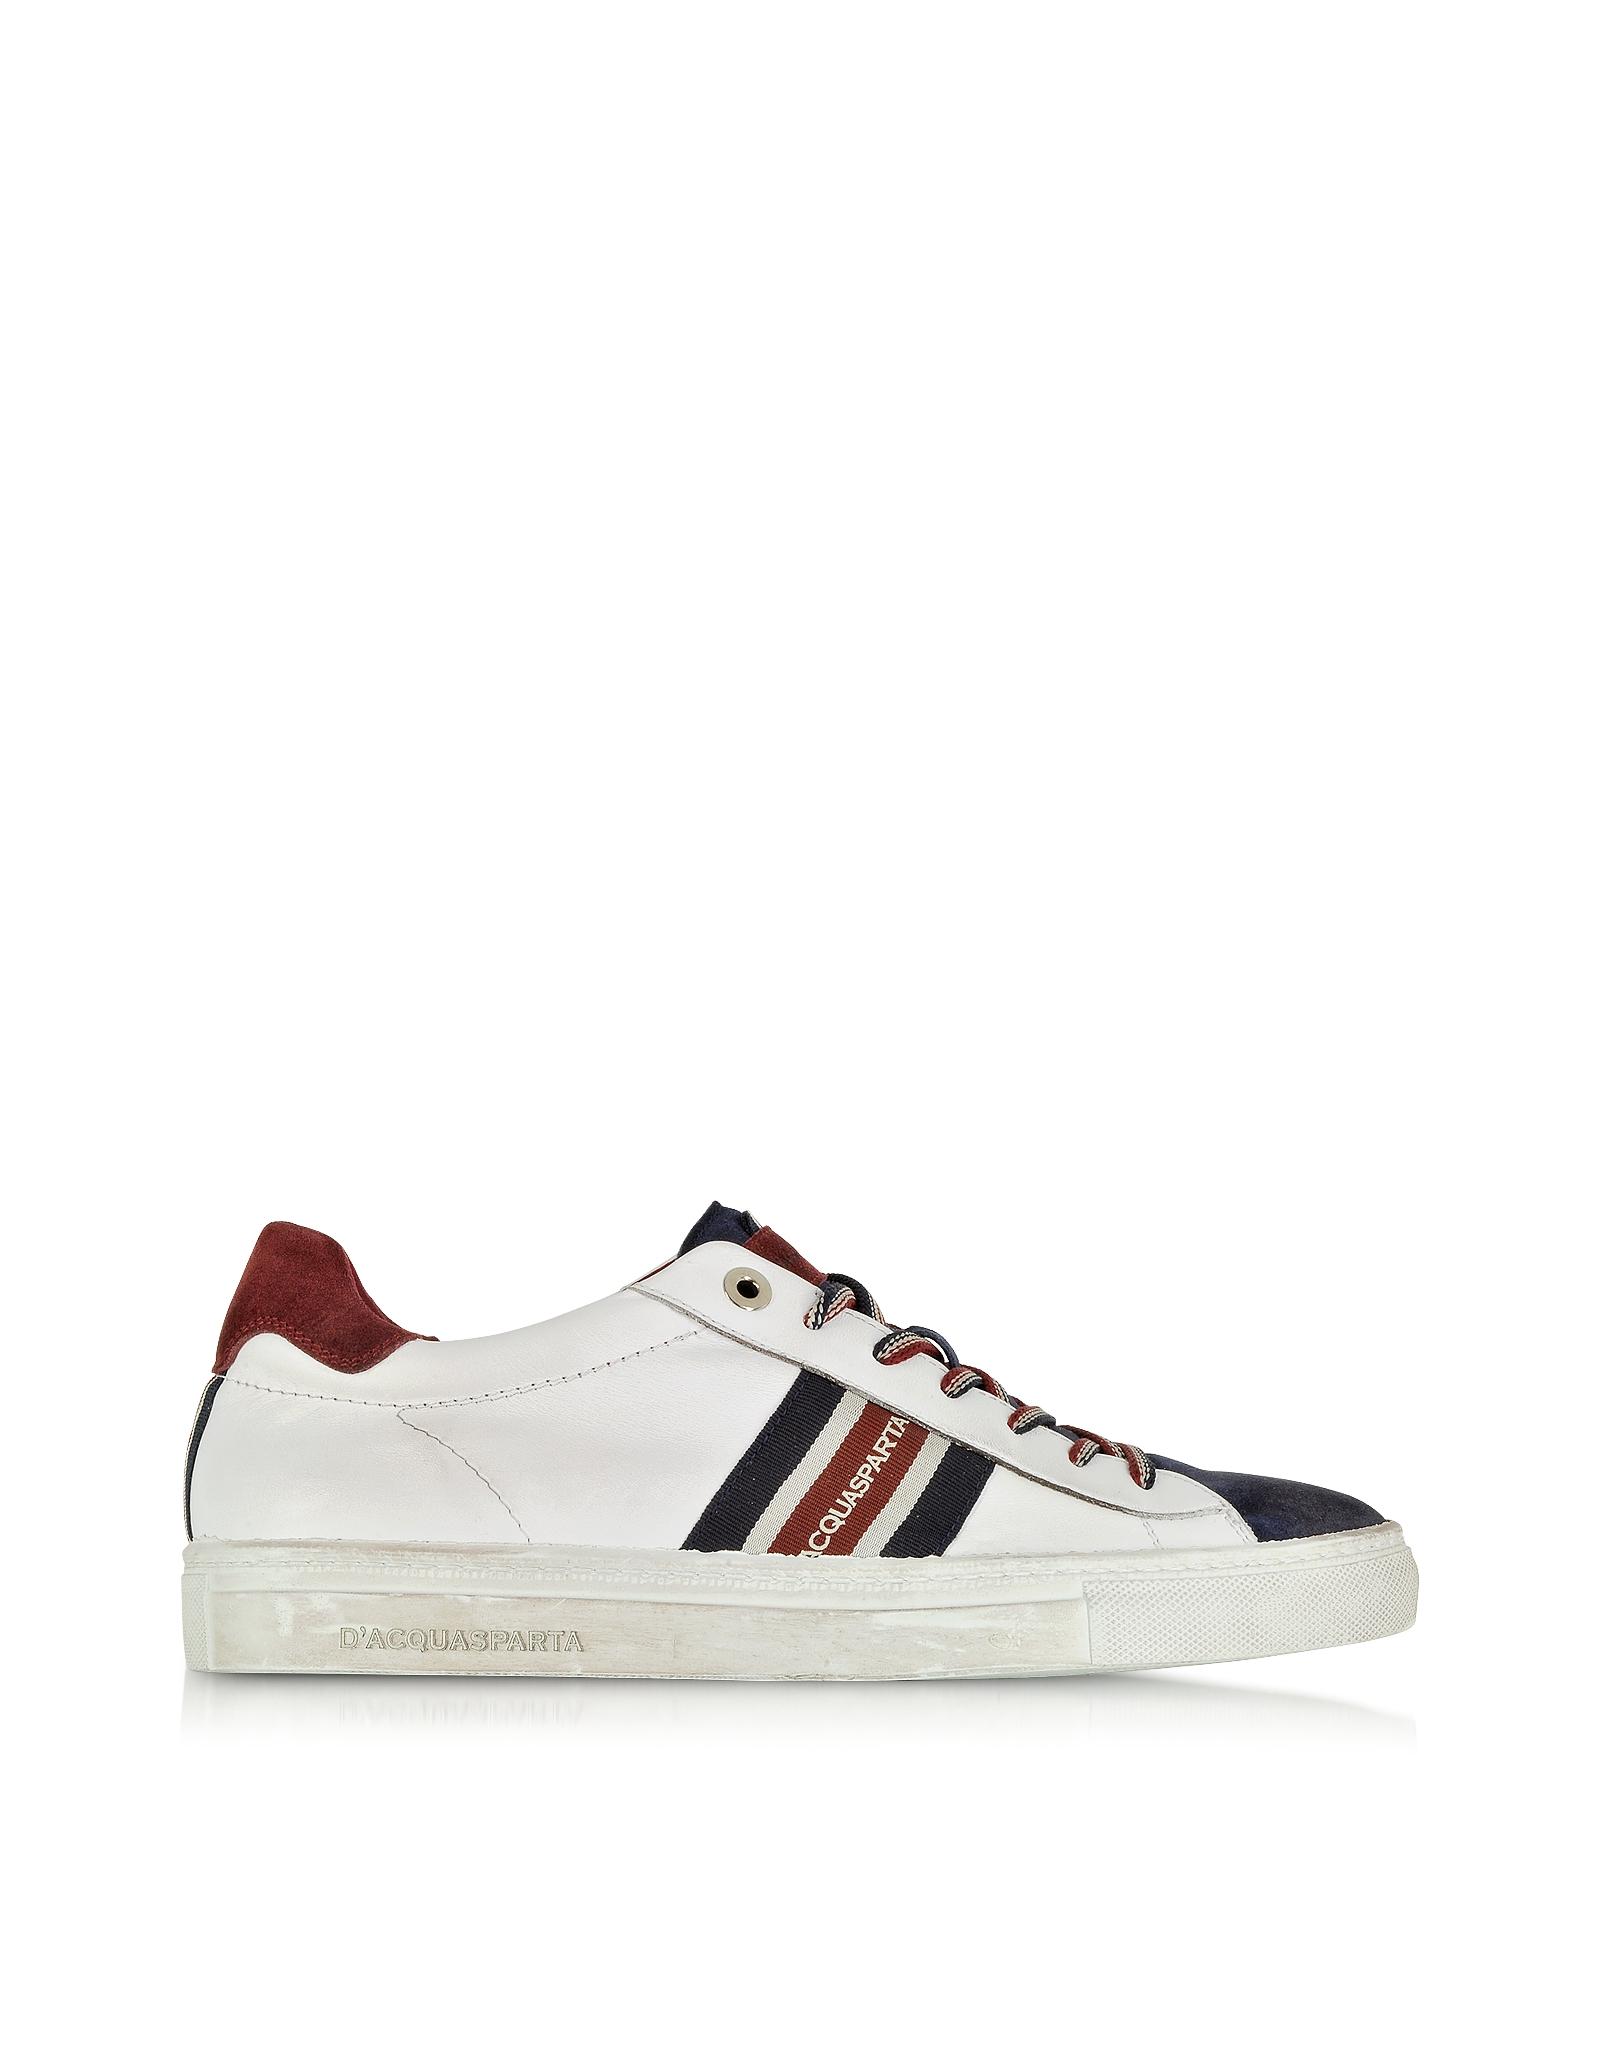 D'acquasparta High-tops Et Chaussures De Sport k1S8IR0UI